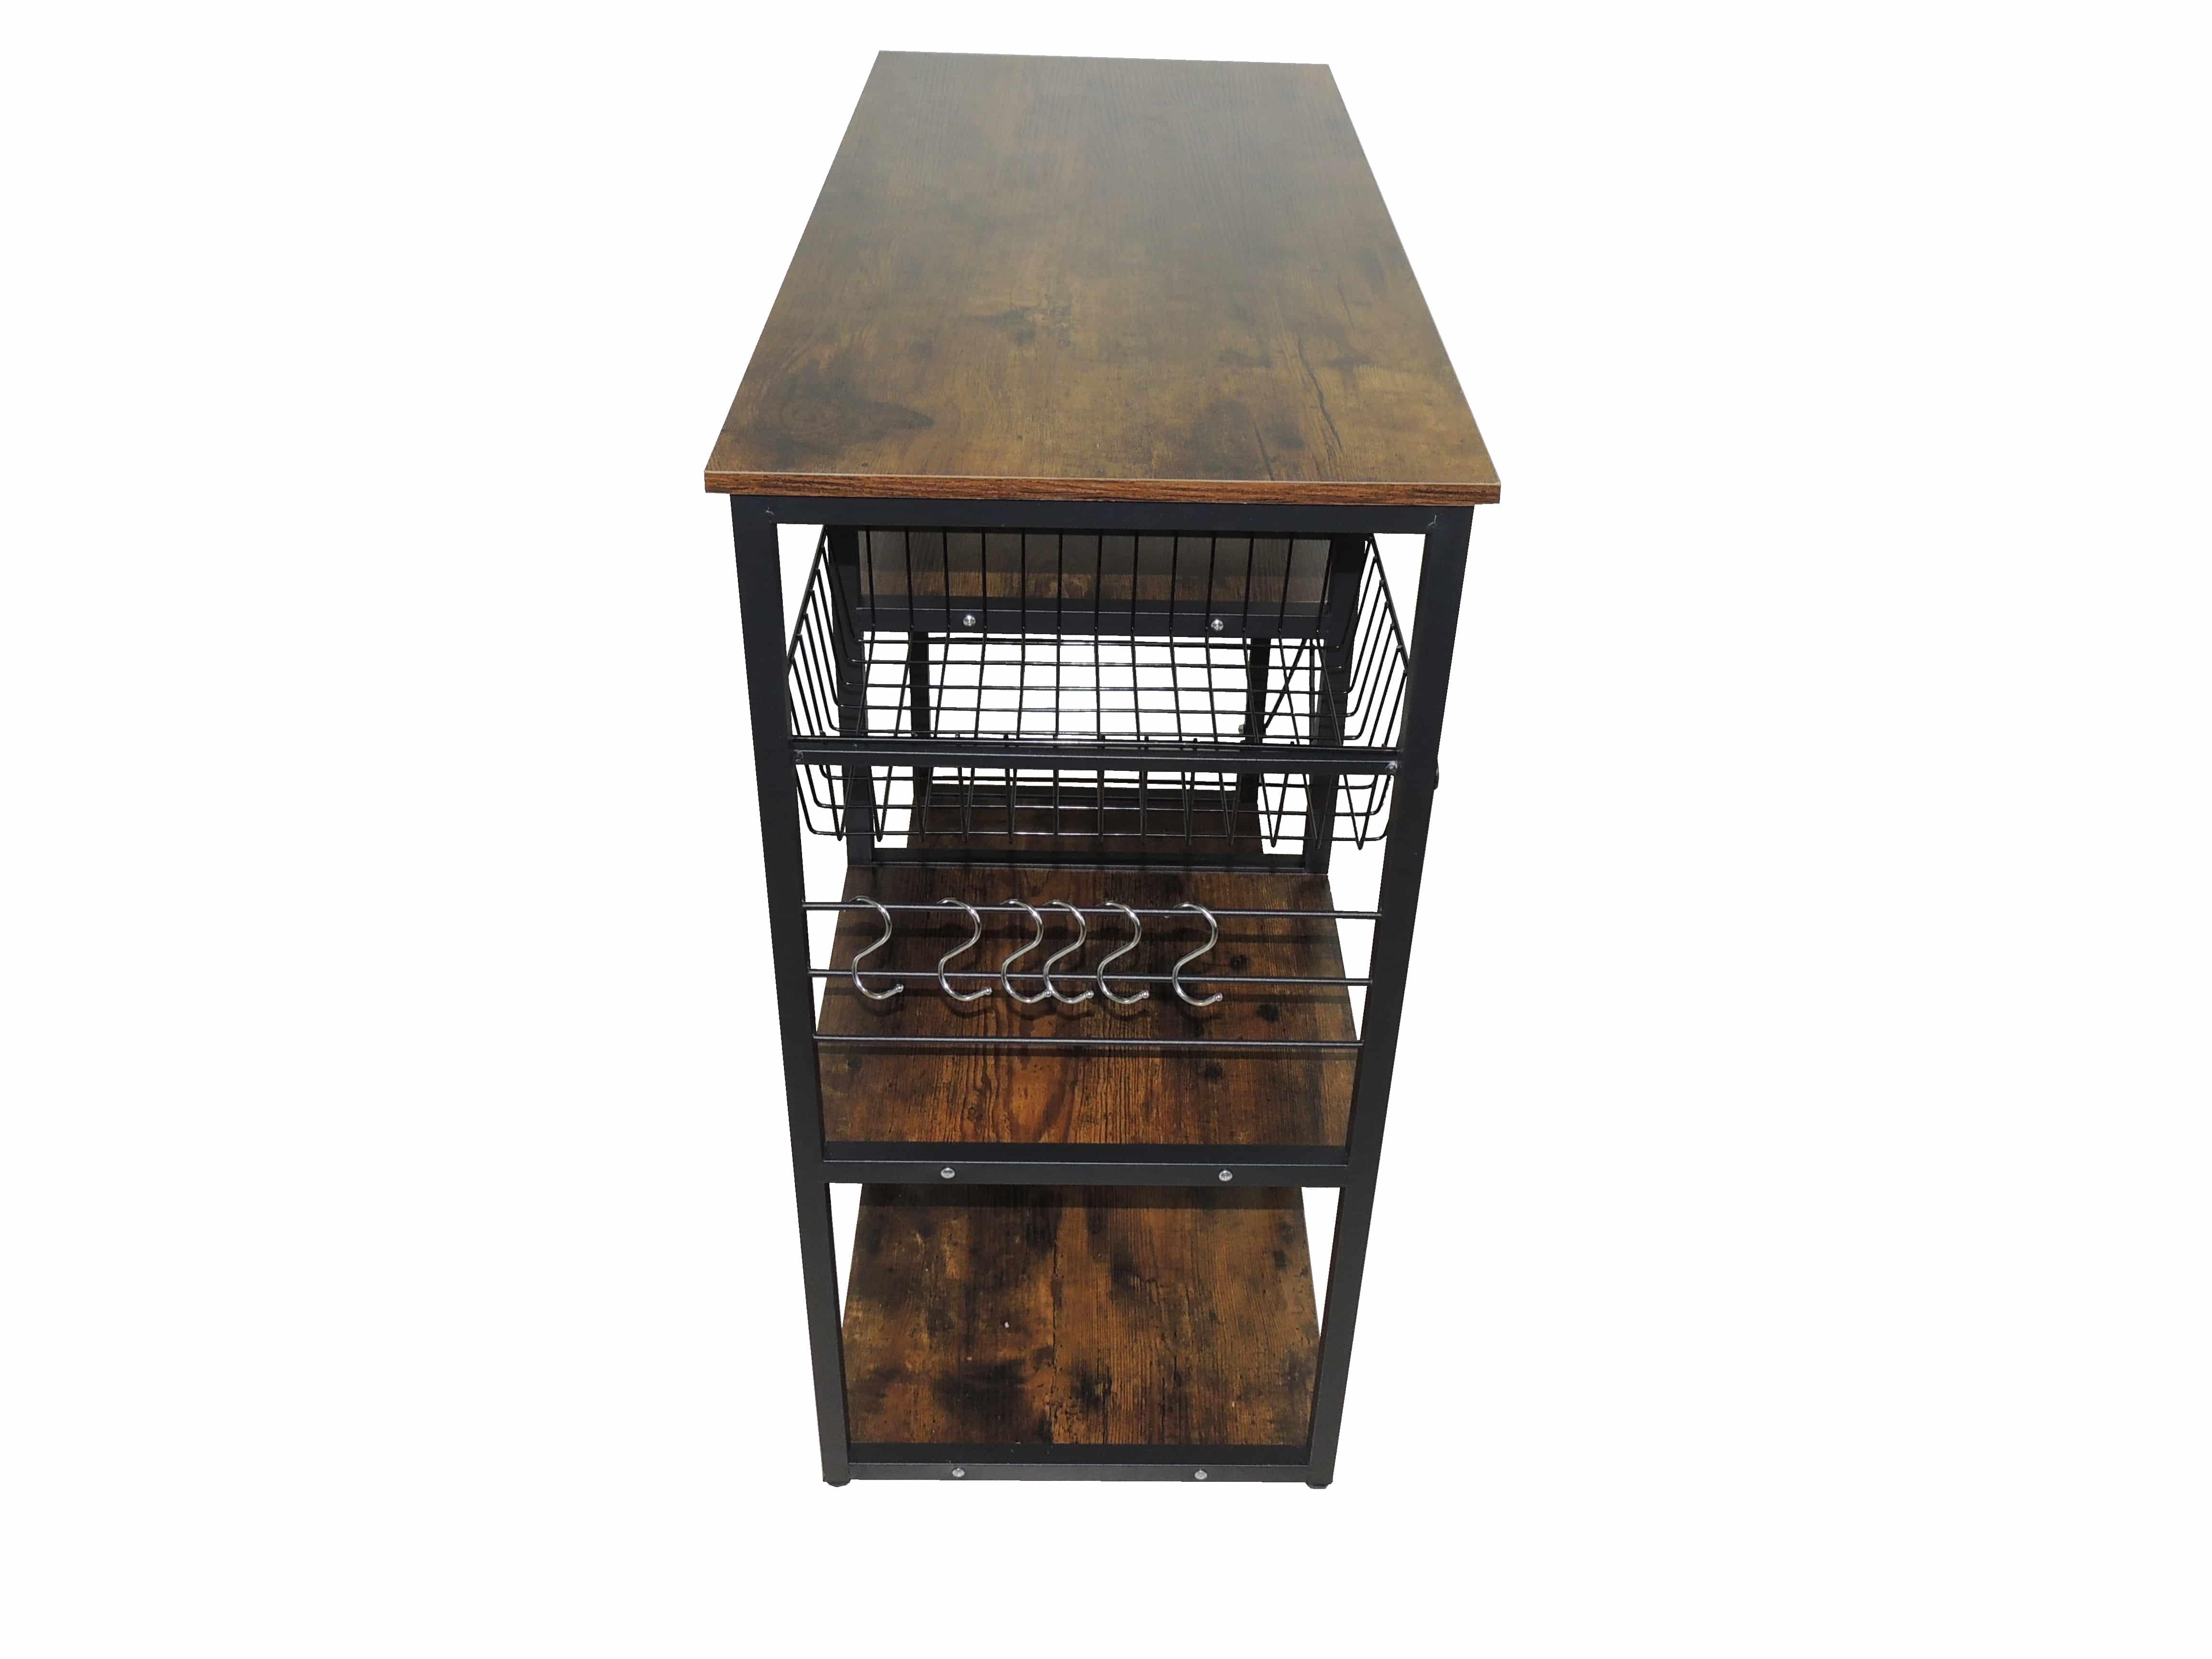 4livingz Retro Industrieel Keukenrek 40x90x84 cm - zwart/bruin